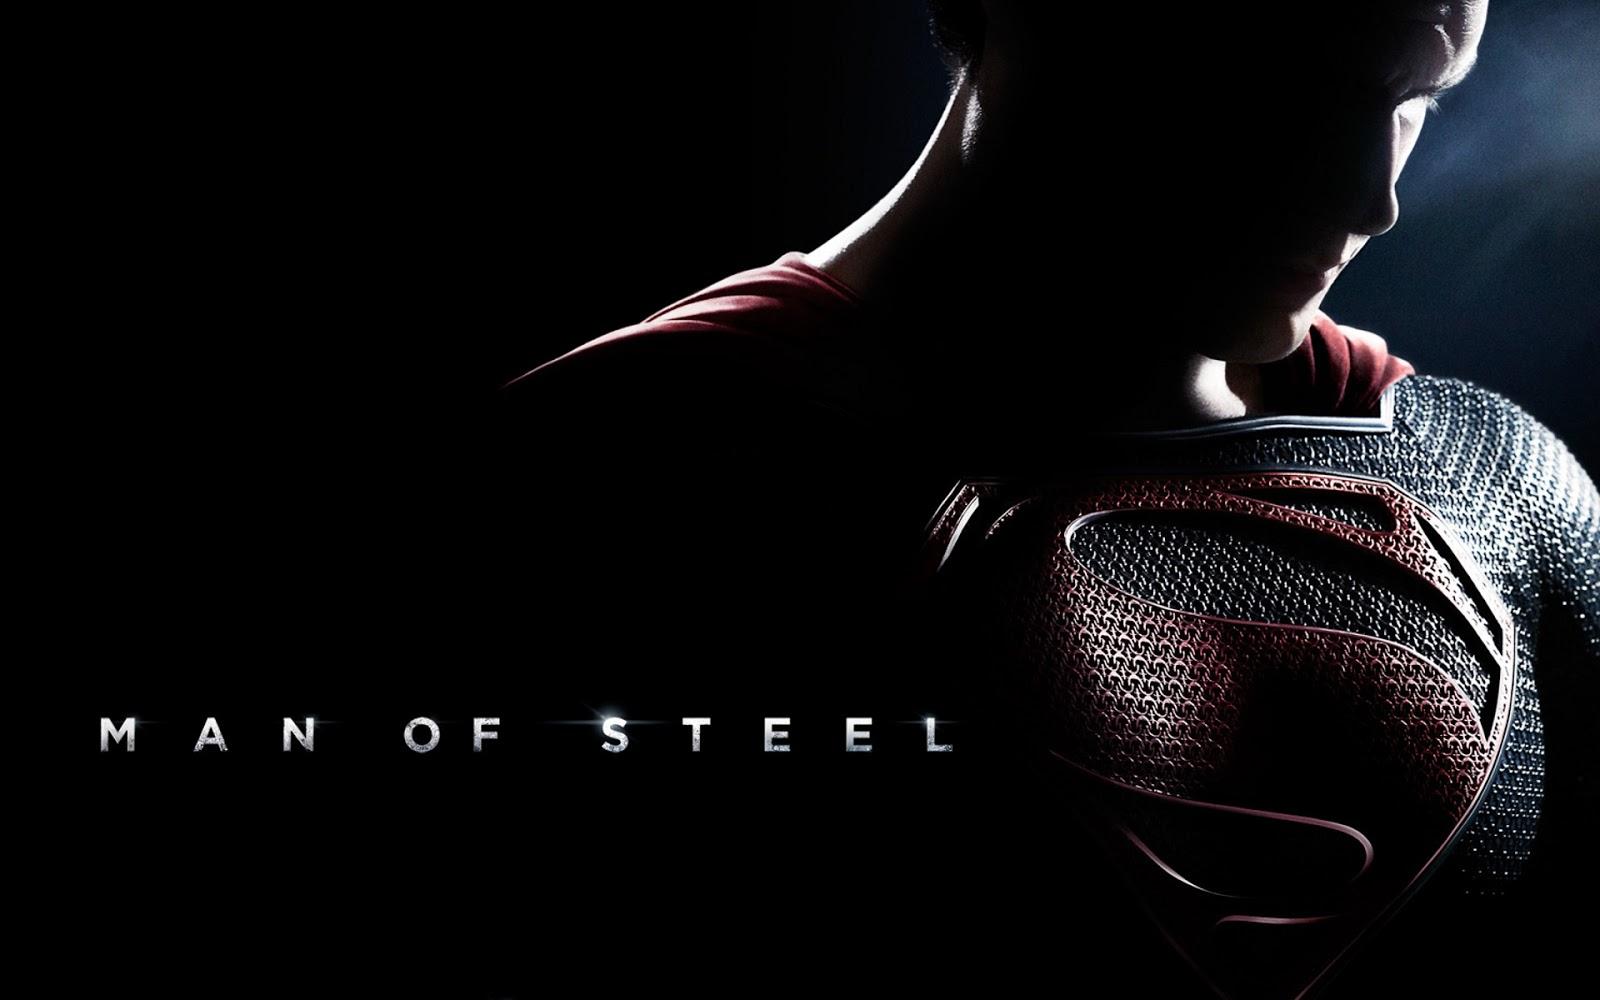 Man of Steel Movie Wide Wallpaper 1920x1080